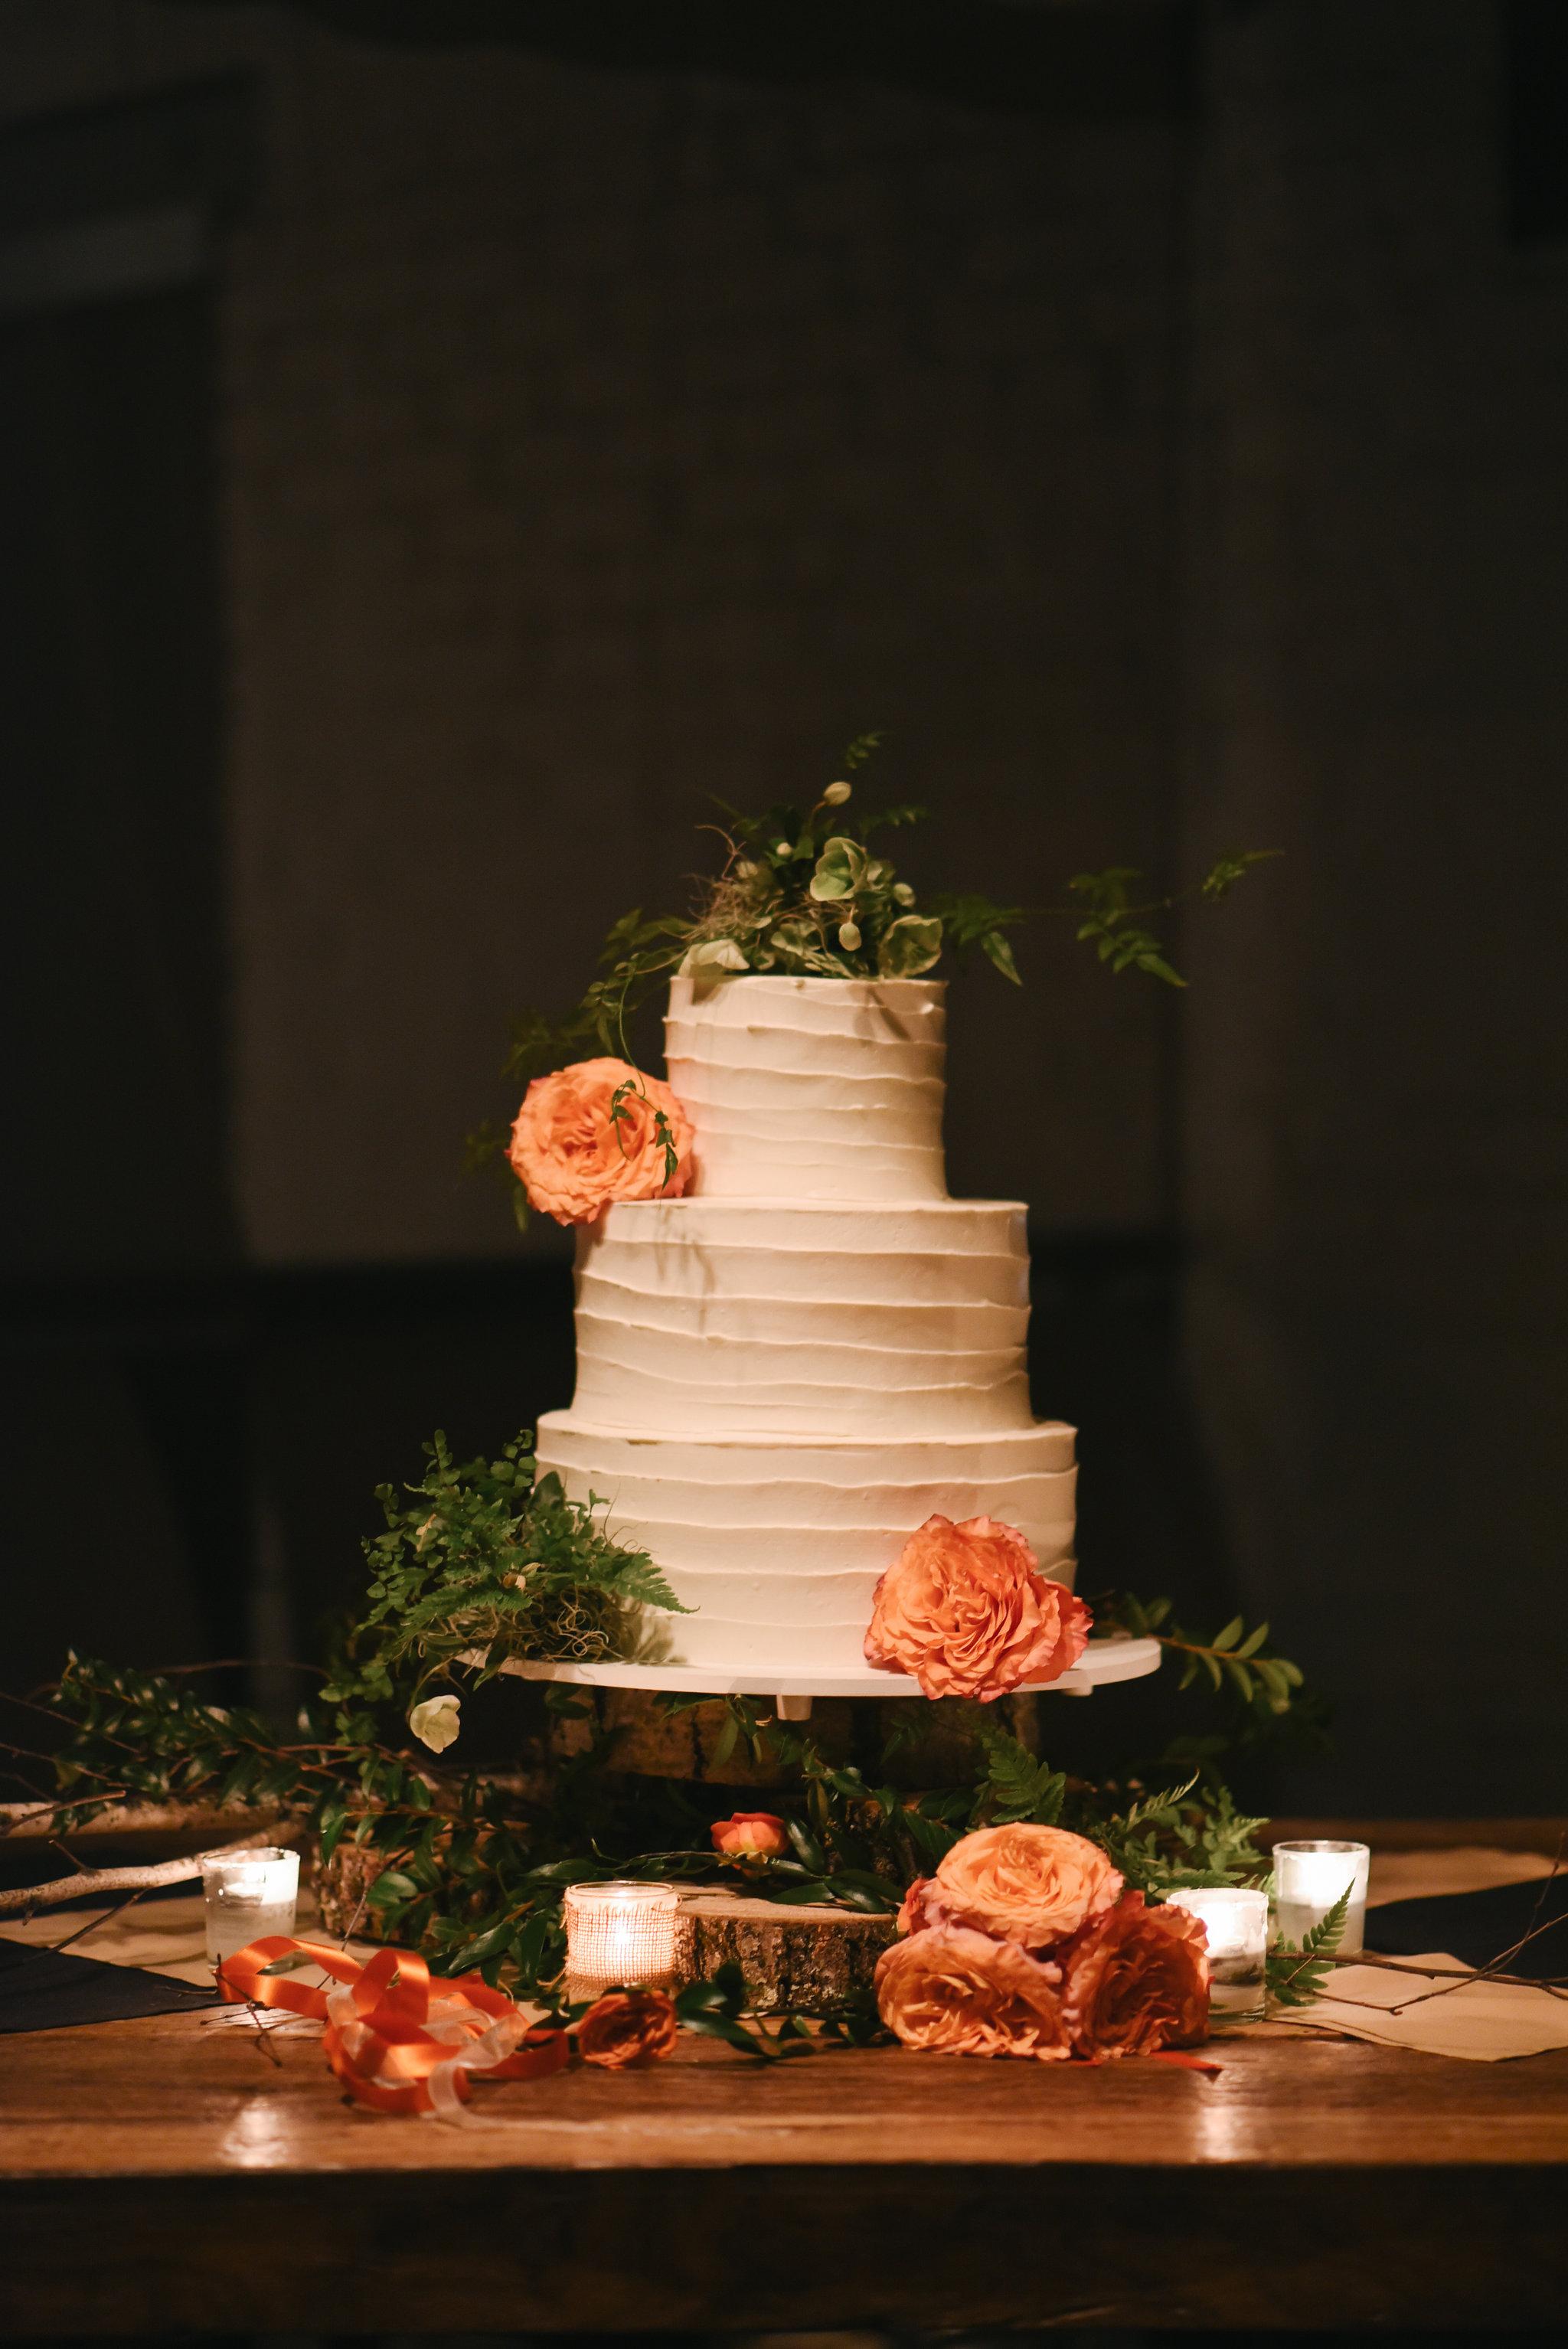 Alexandria, DC, Wedding Cake, Rustic, Pastries by Randolph, Fall Wedding, Reception, Cake Photo